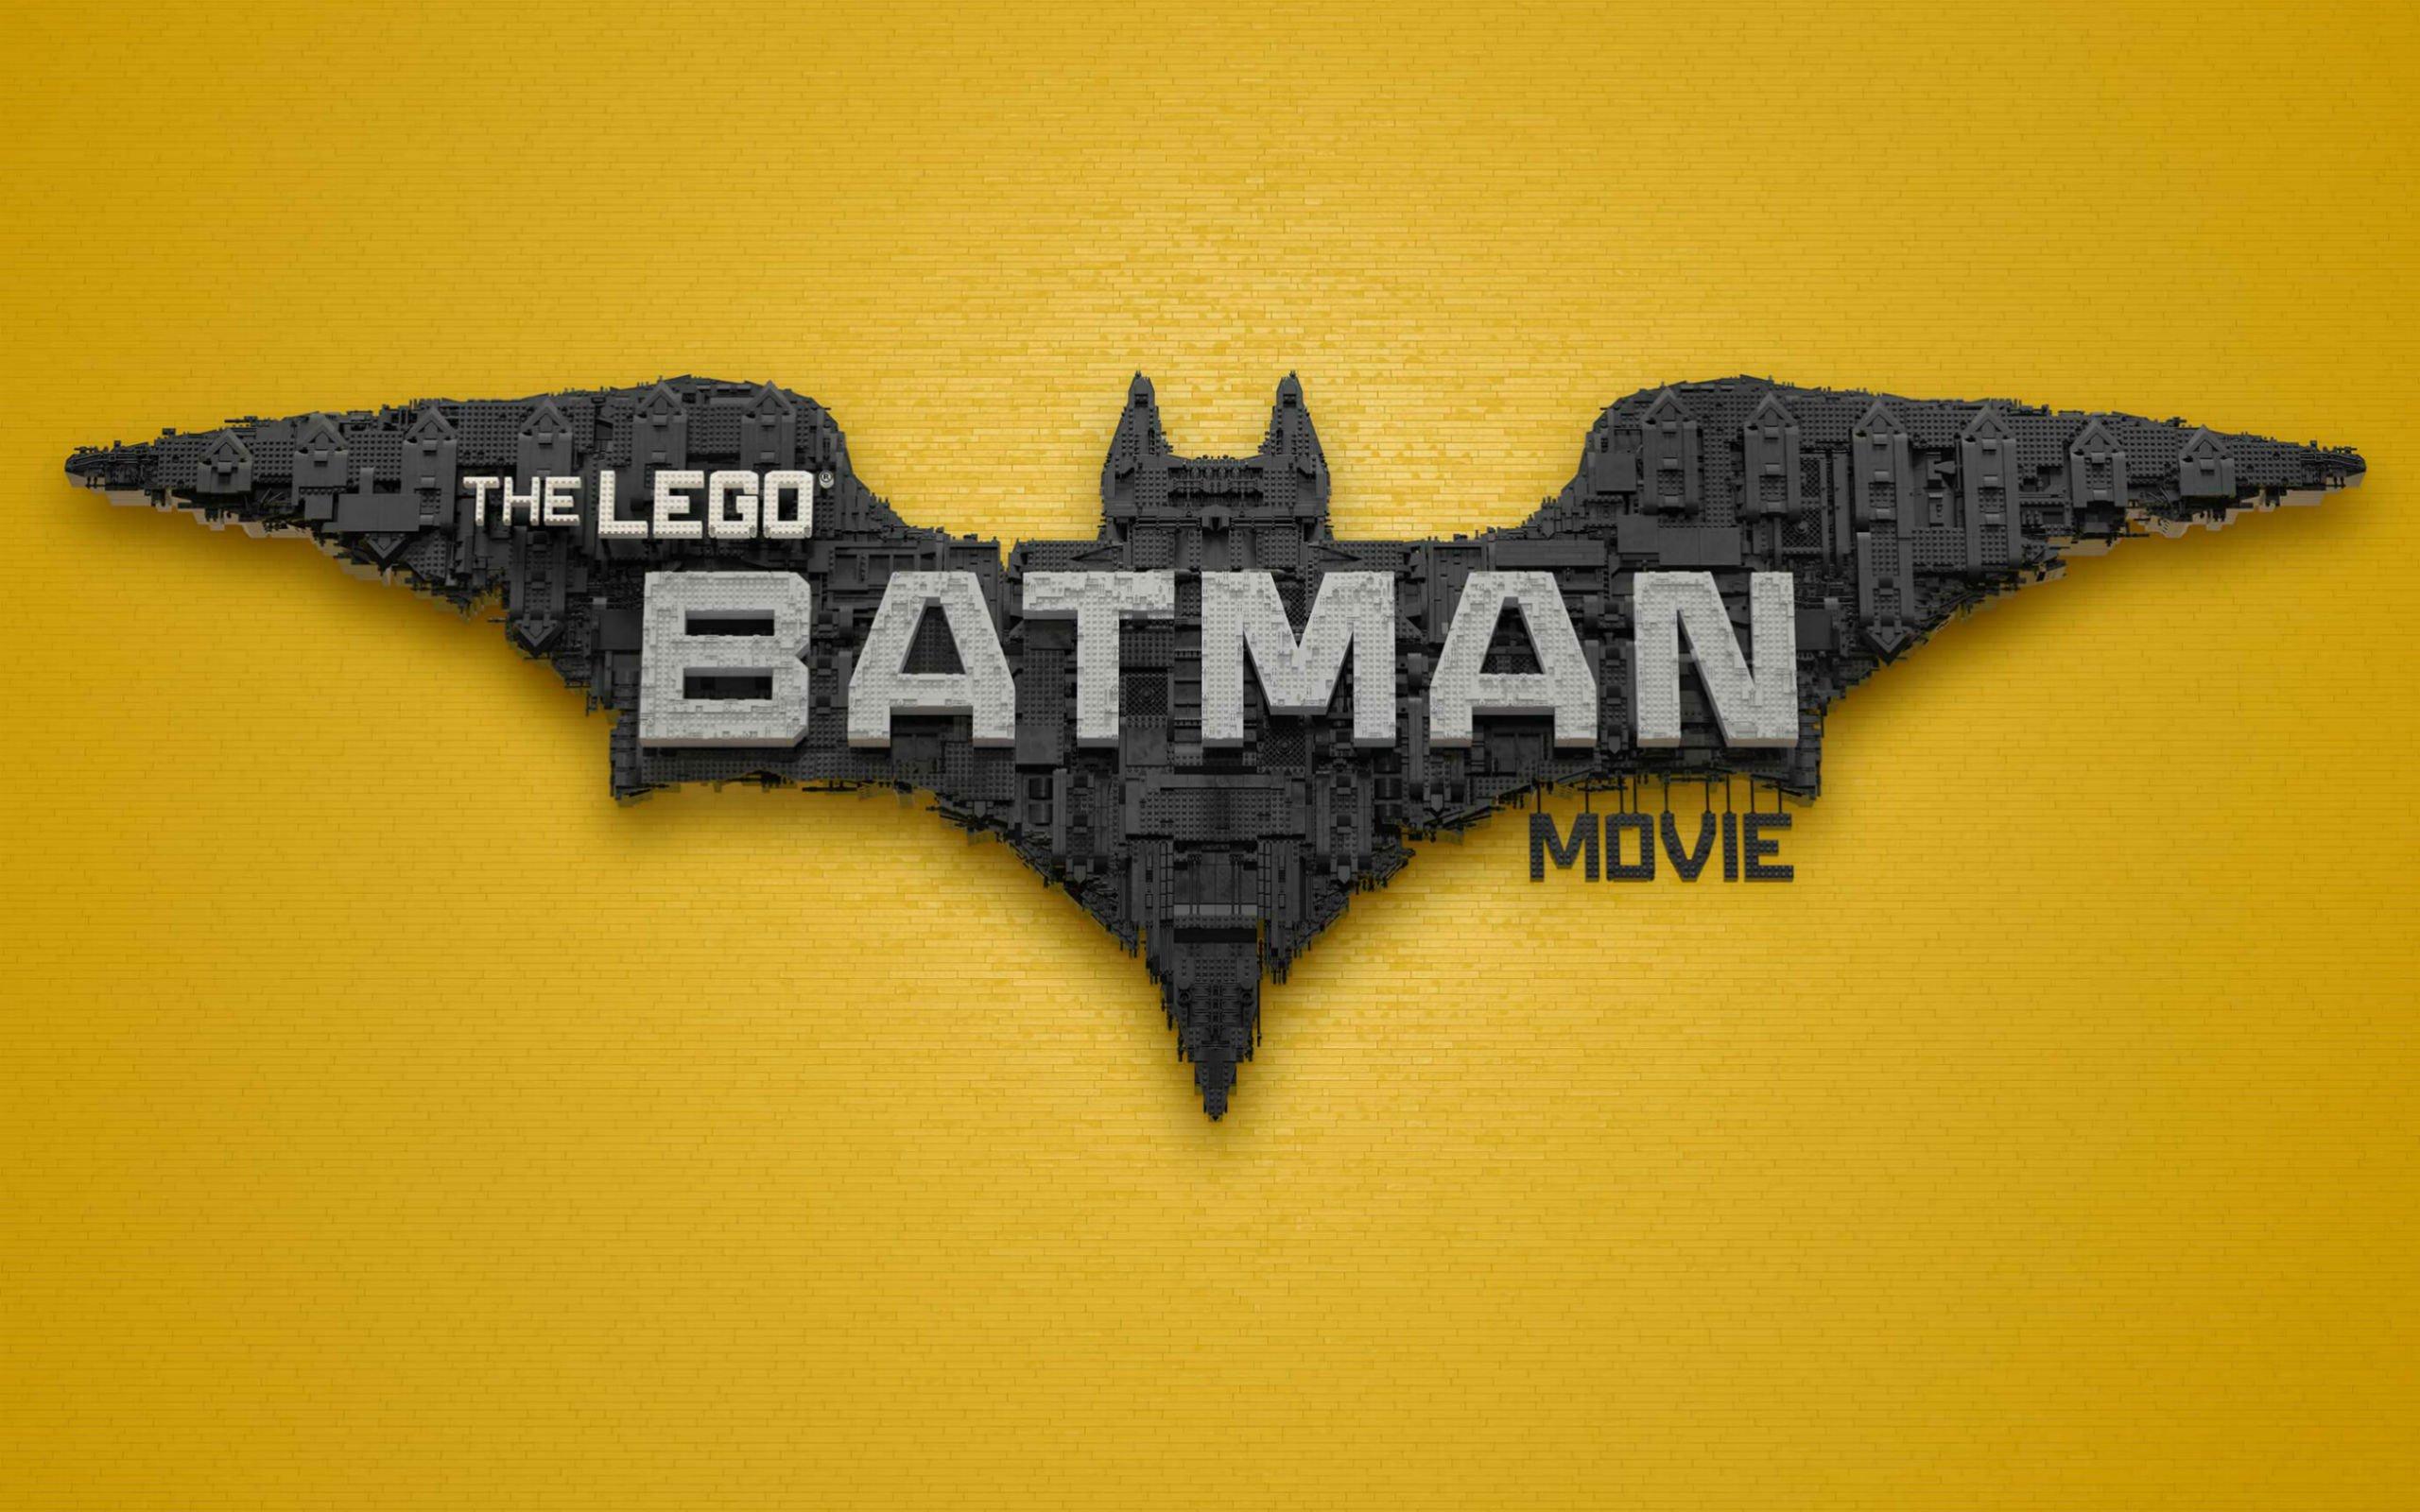 The lego batman movie wallpapers 11 wallpapers hd wallpapers the lego batman movie hd wallpapers backgrounds wallpaper 25601600 voltagebd Gallery